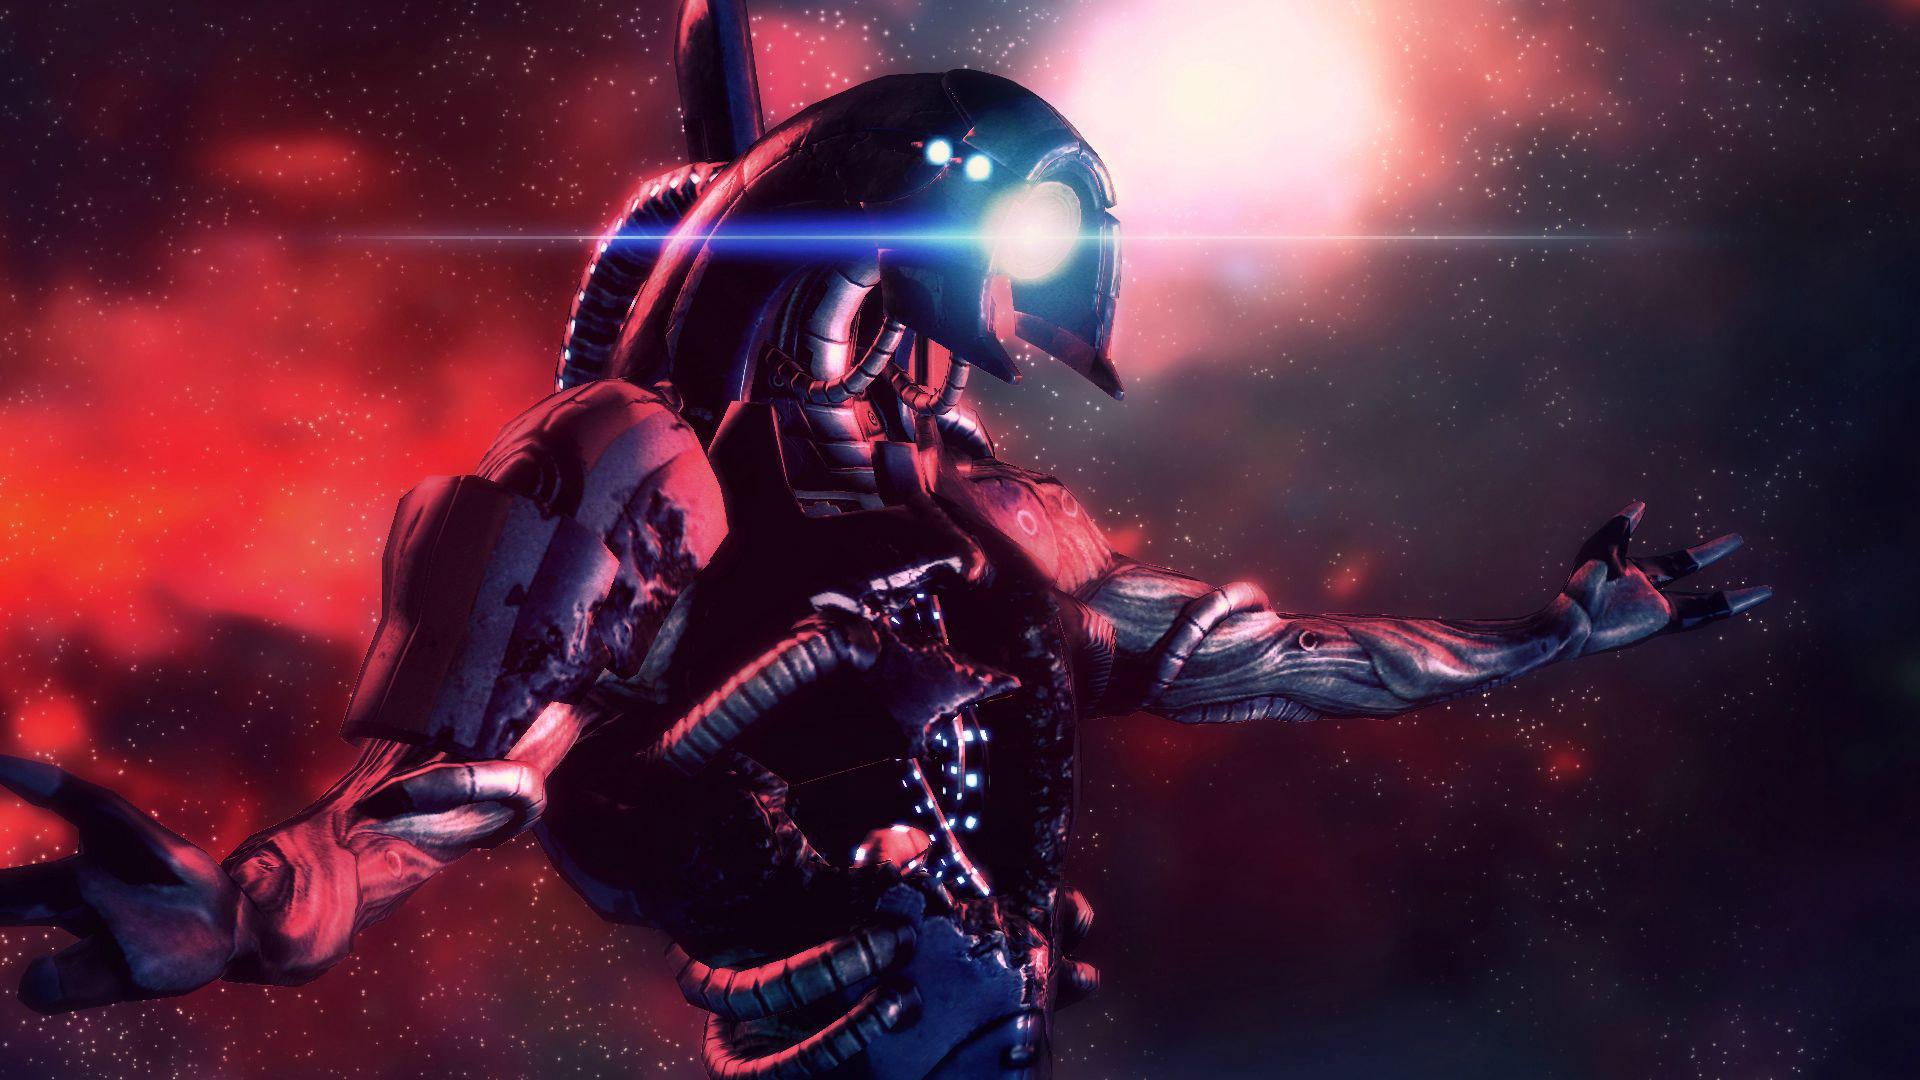 Free Mass Effect 2 Wallpaper in 1920x1080